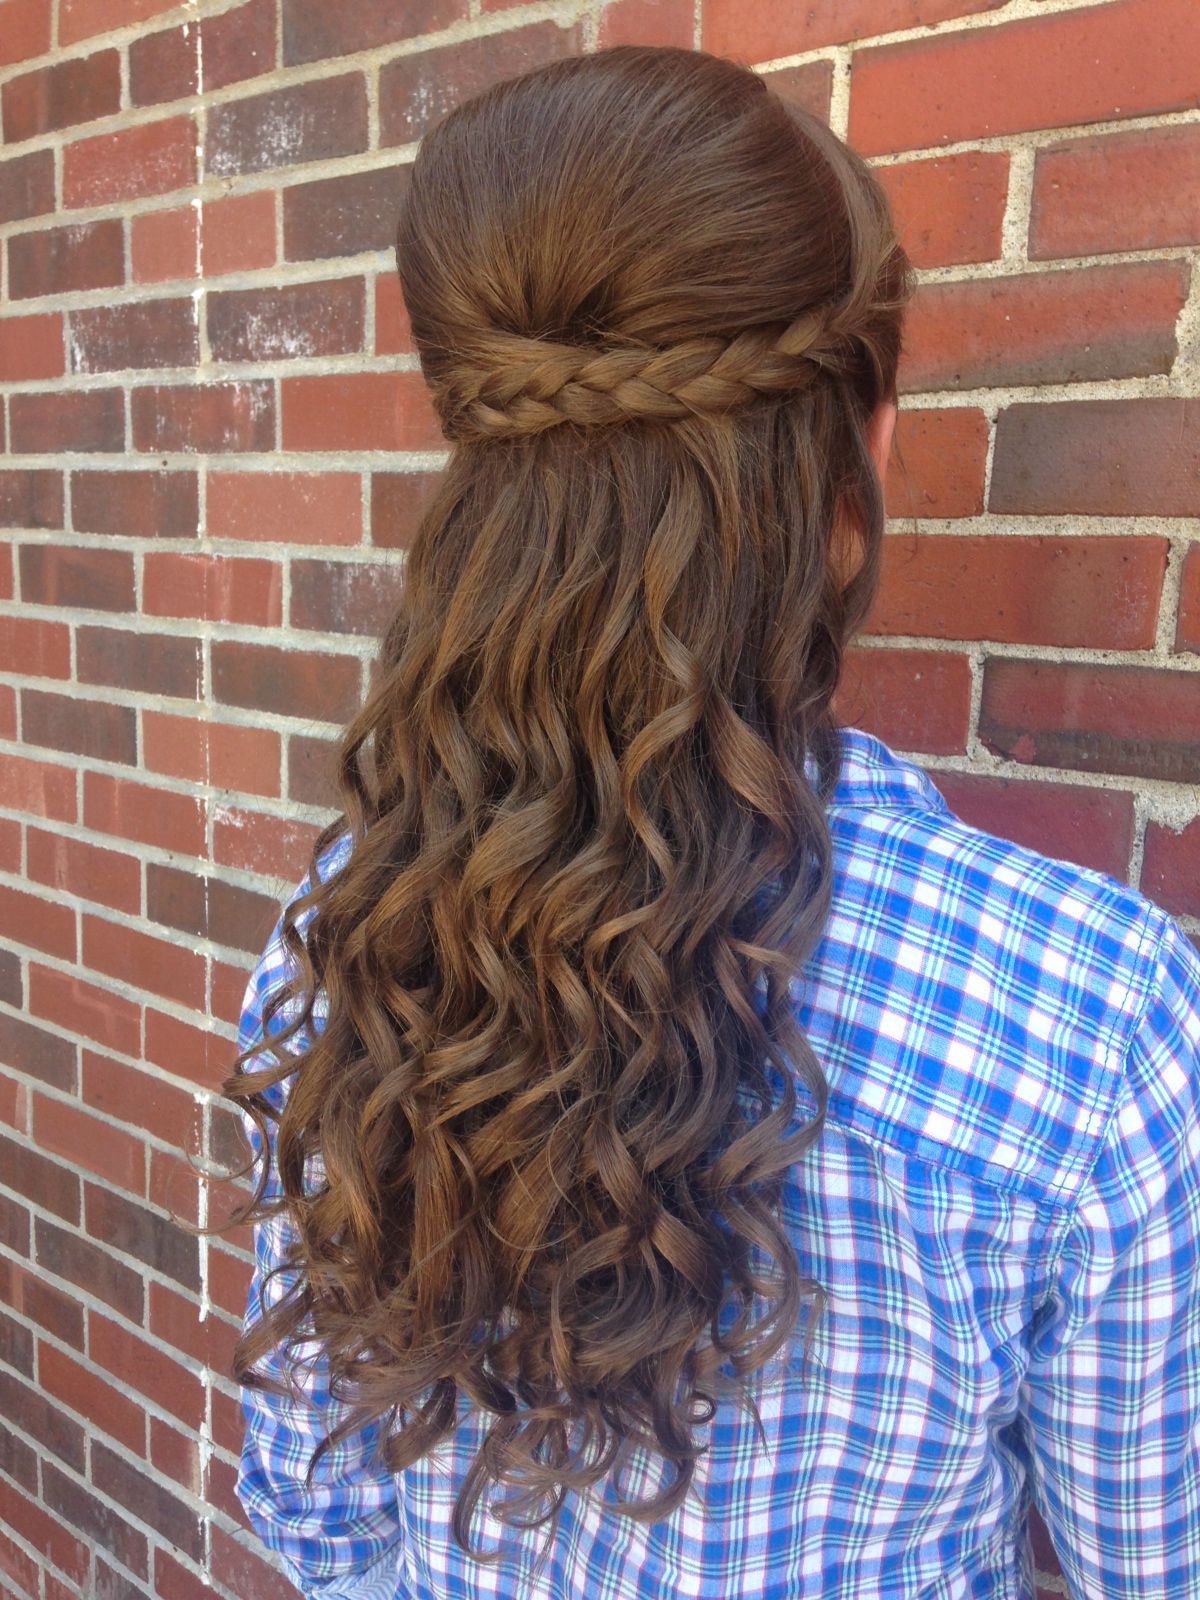 Prom hair half up half down curly braided bump romantic updo